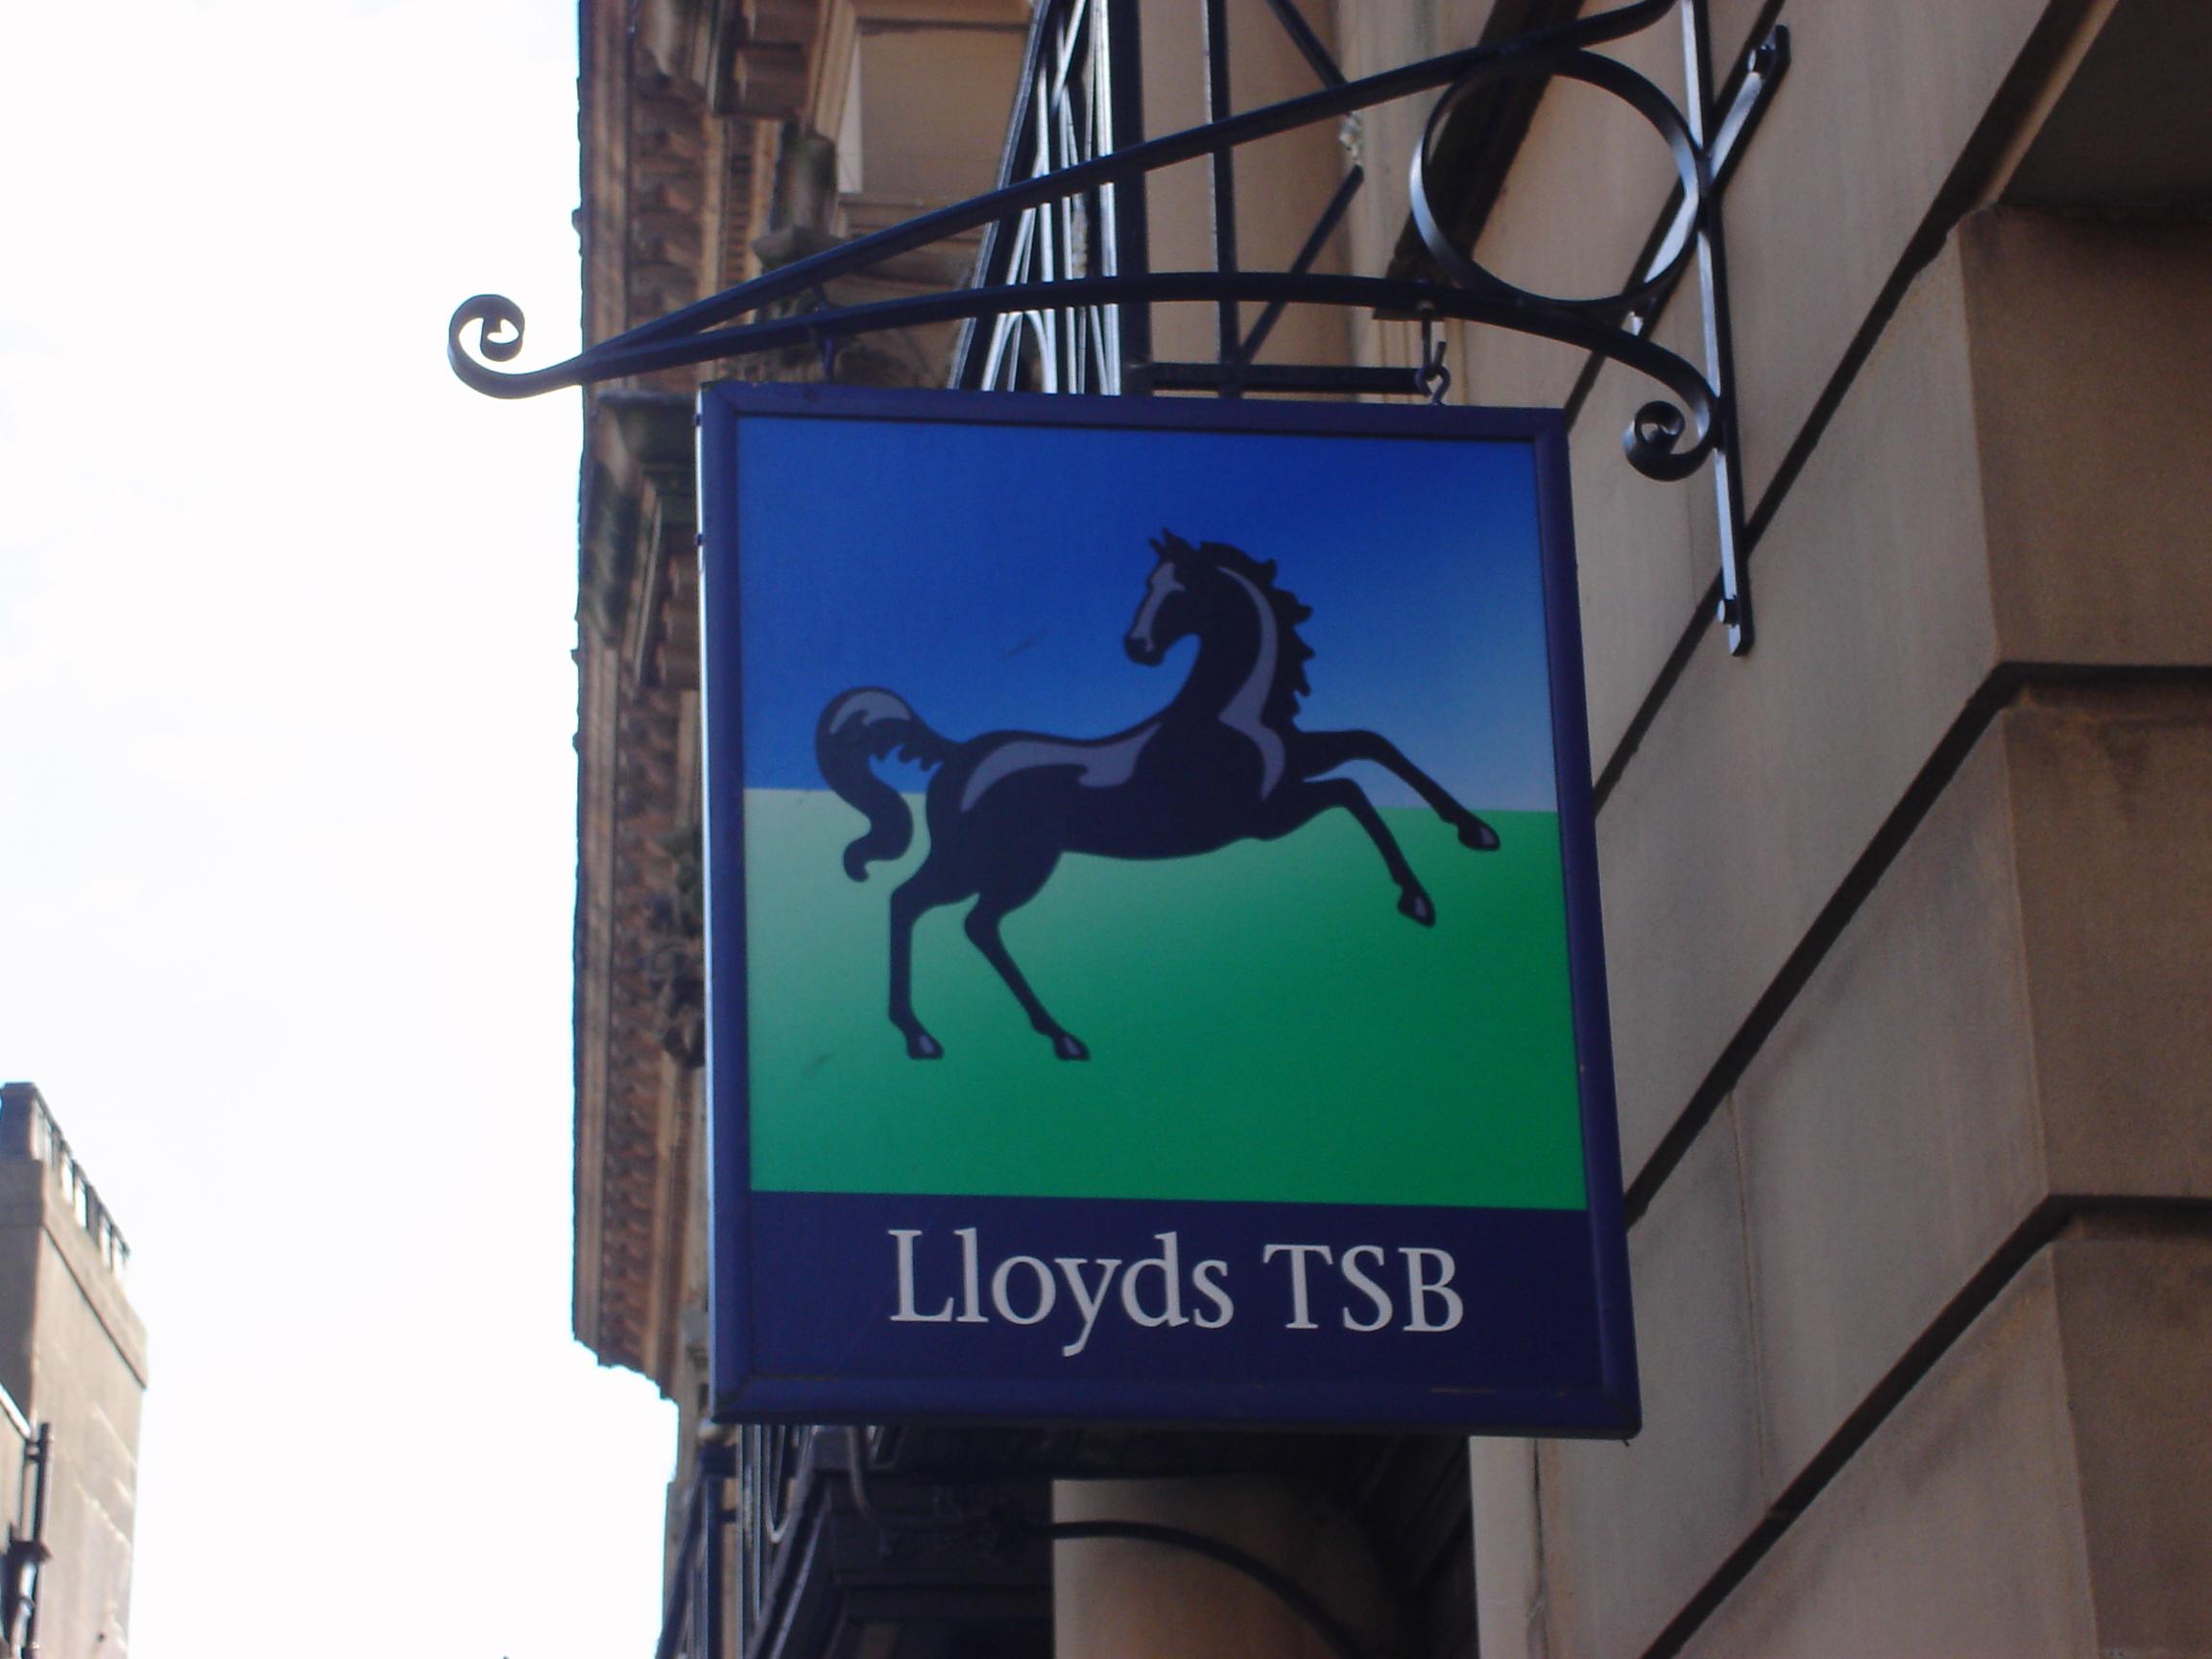 File:Lloyds TSB.jpg - Wikipedia, the free encyclopedia